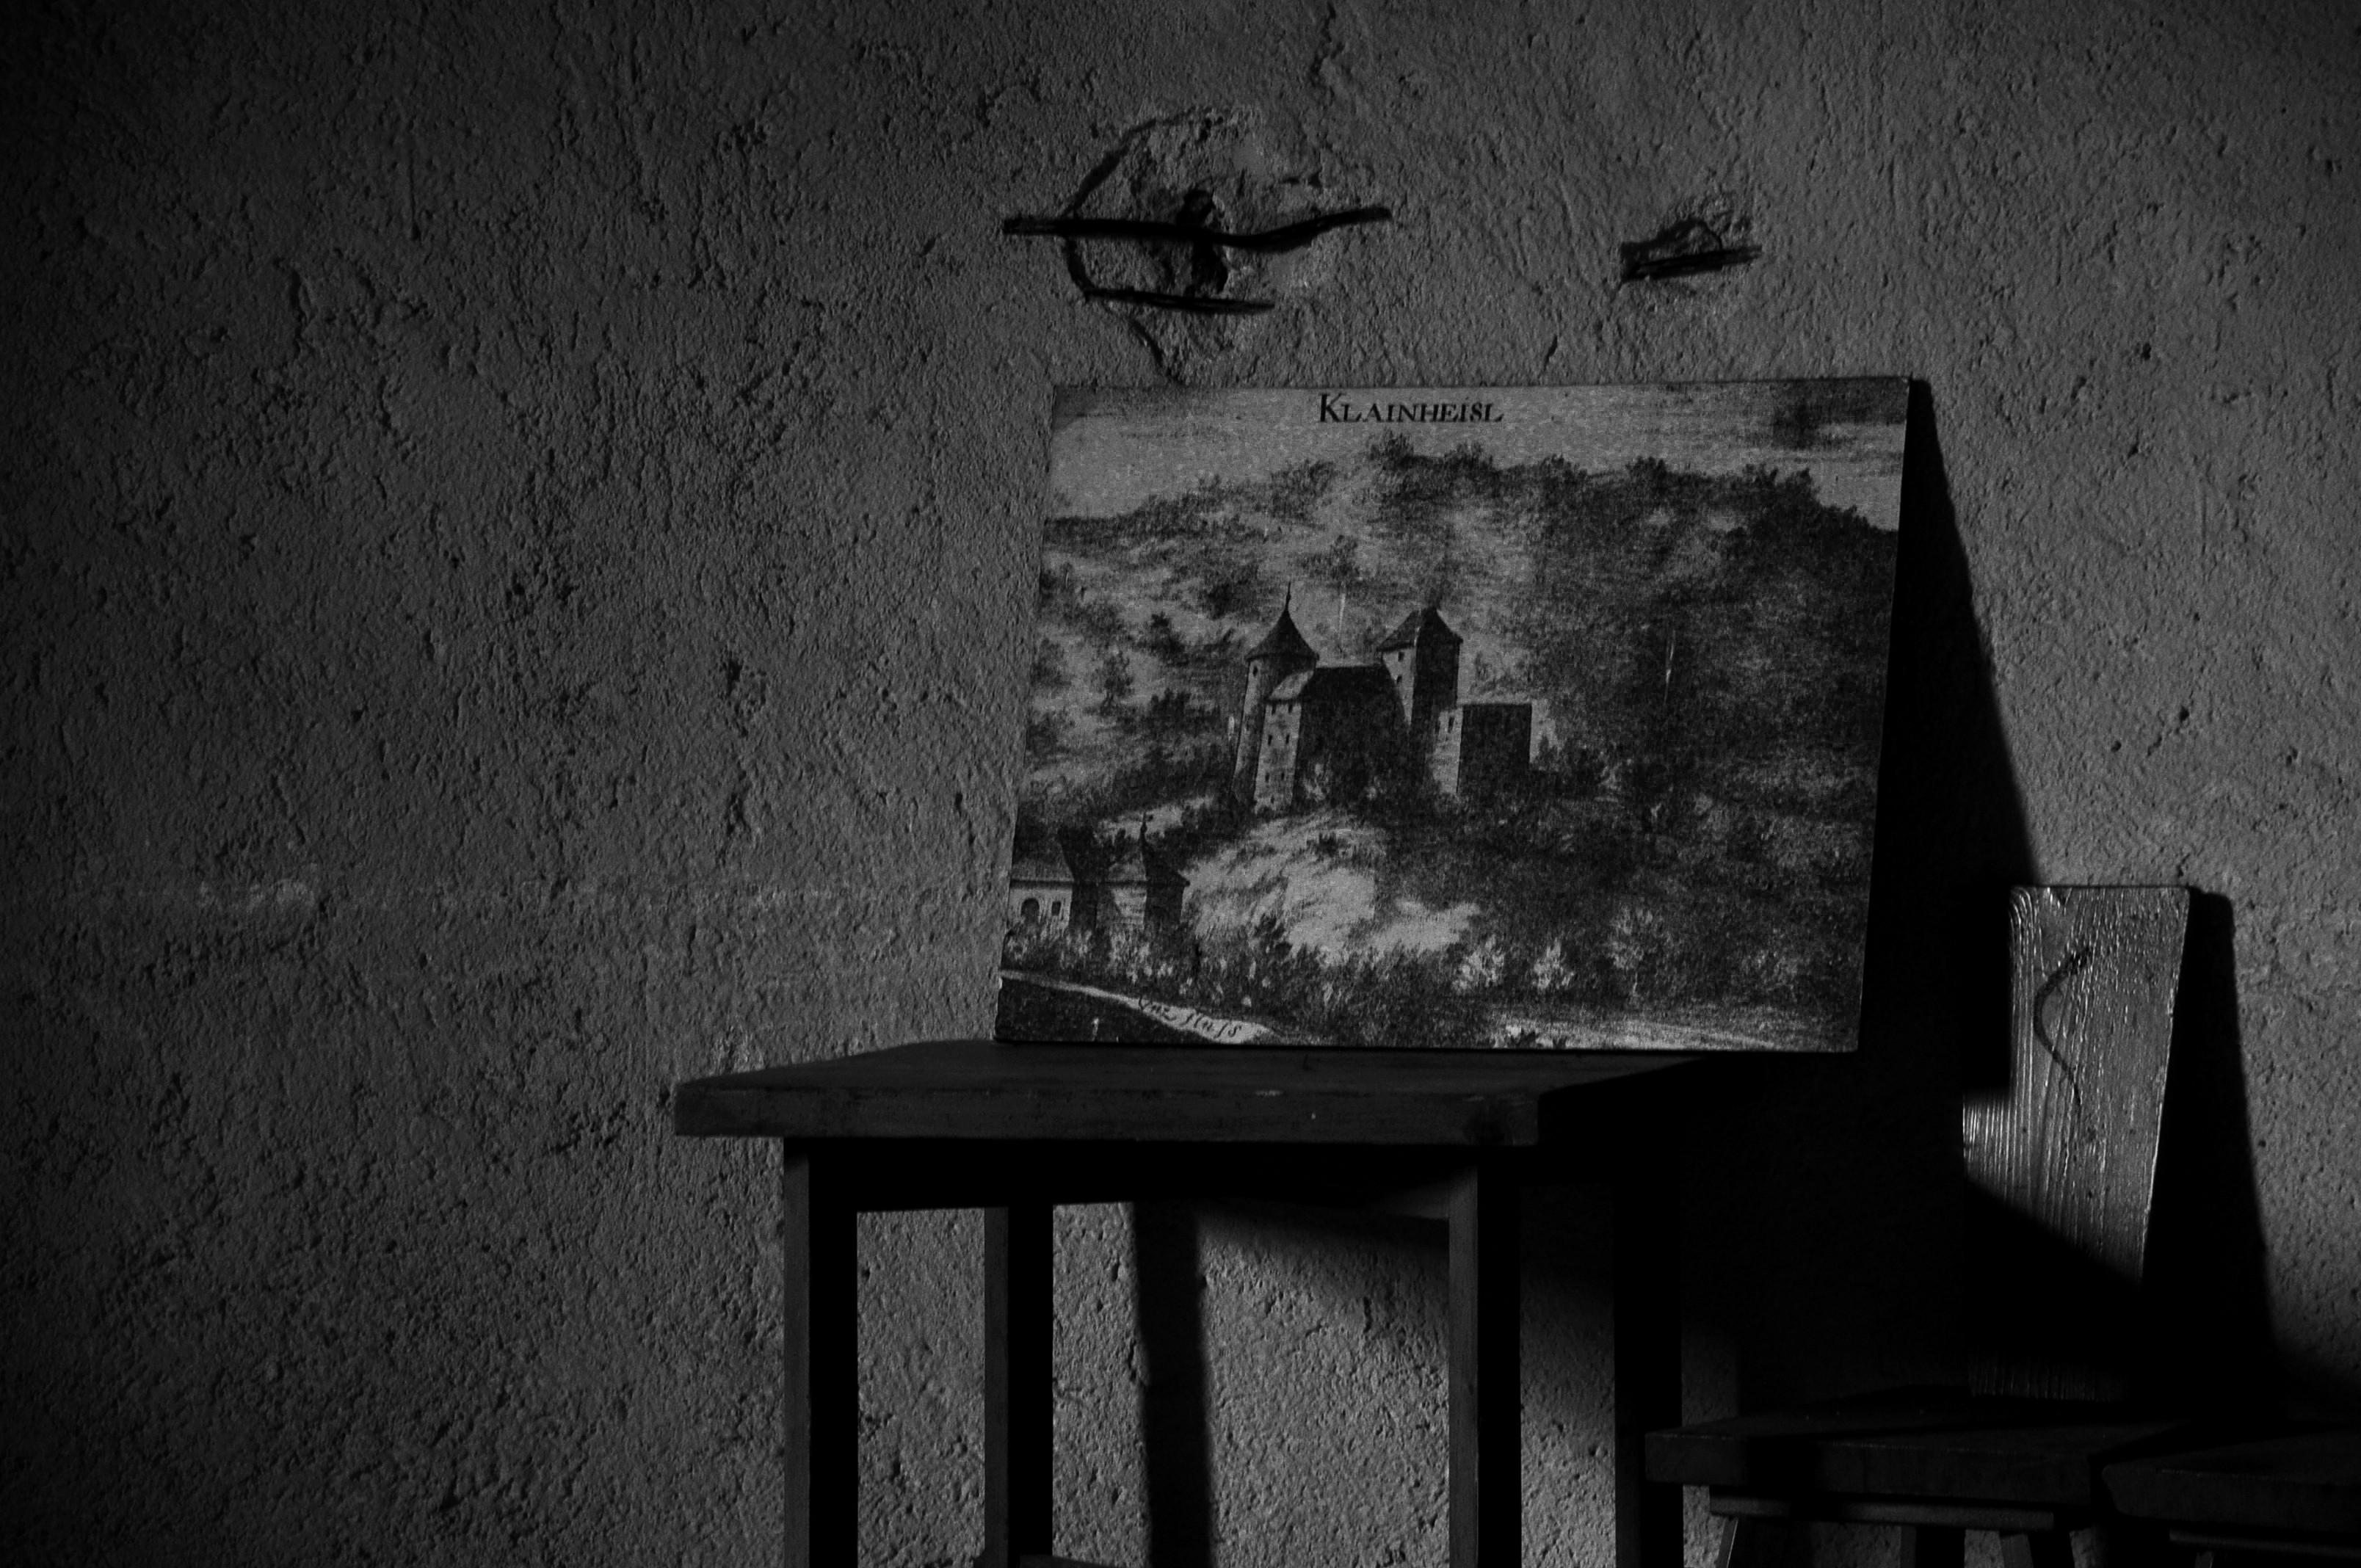 Still life black & white photography.